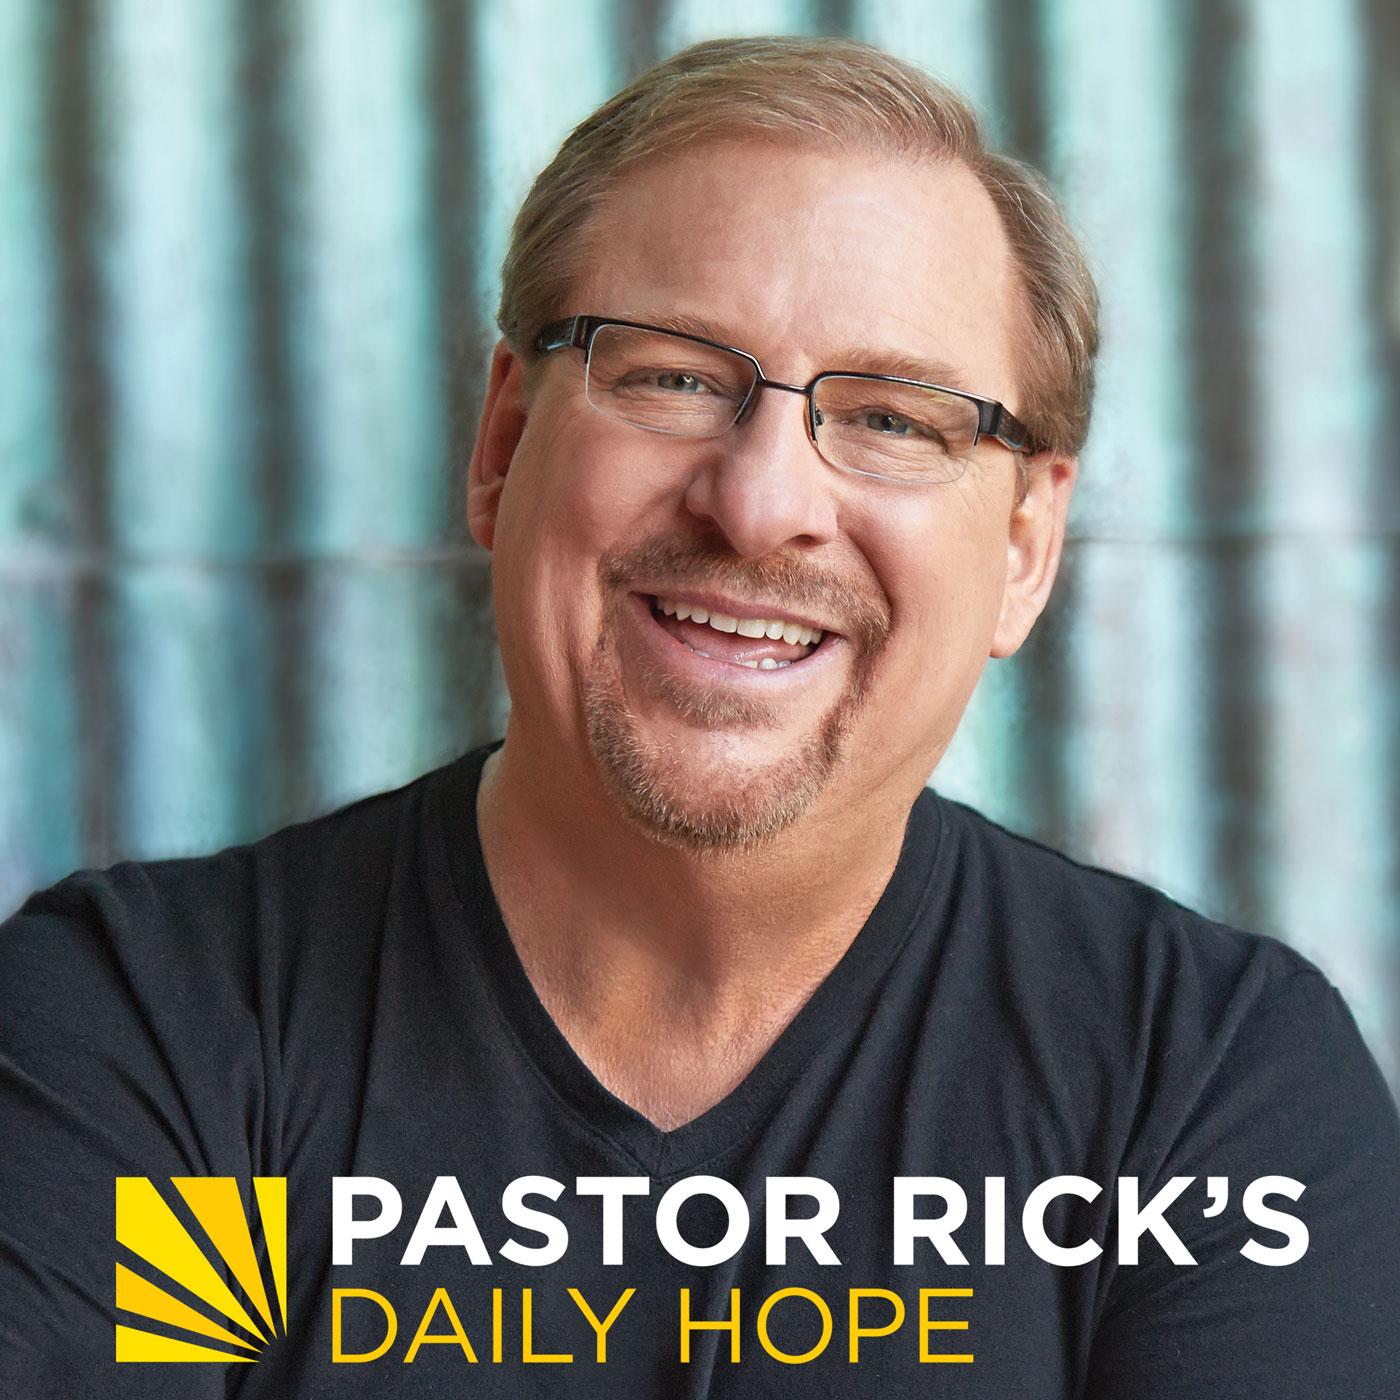 Pastor Rick's Daily Hope